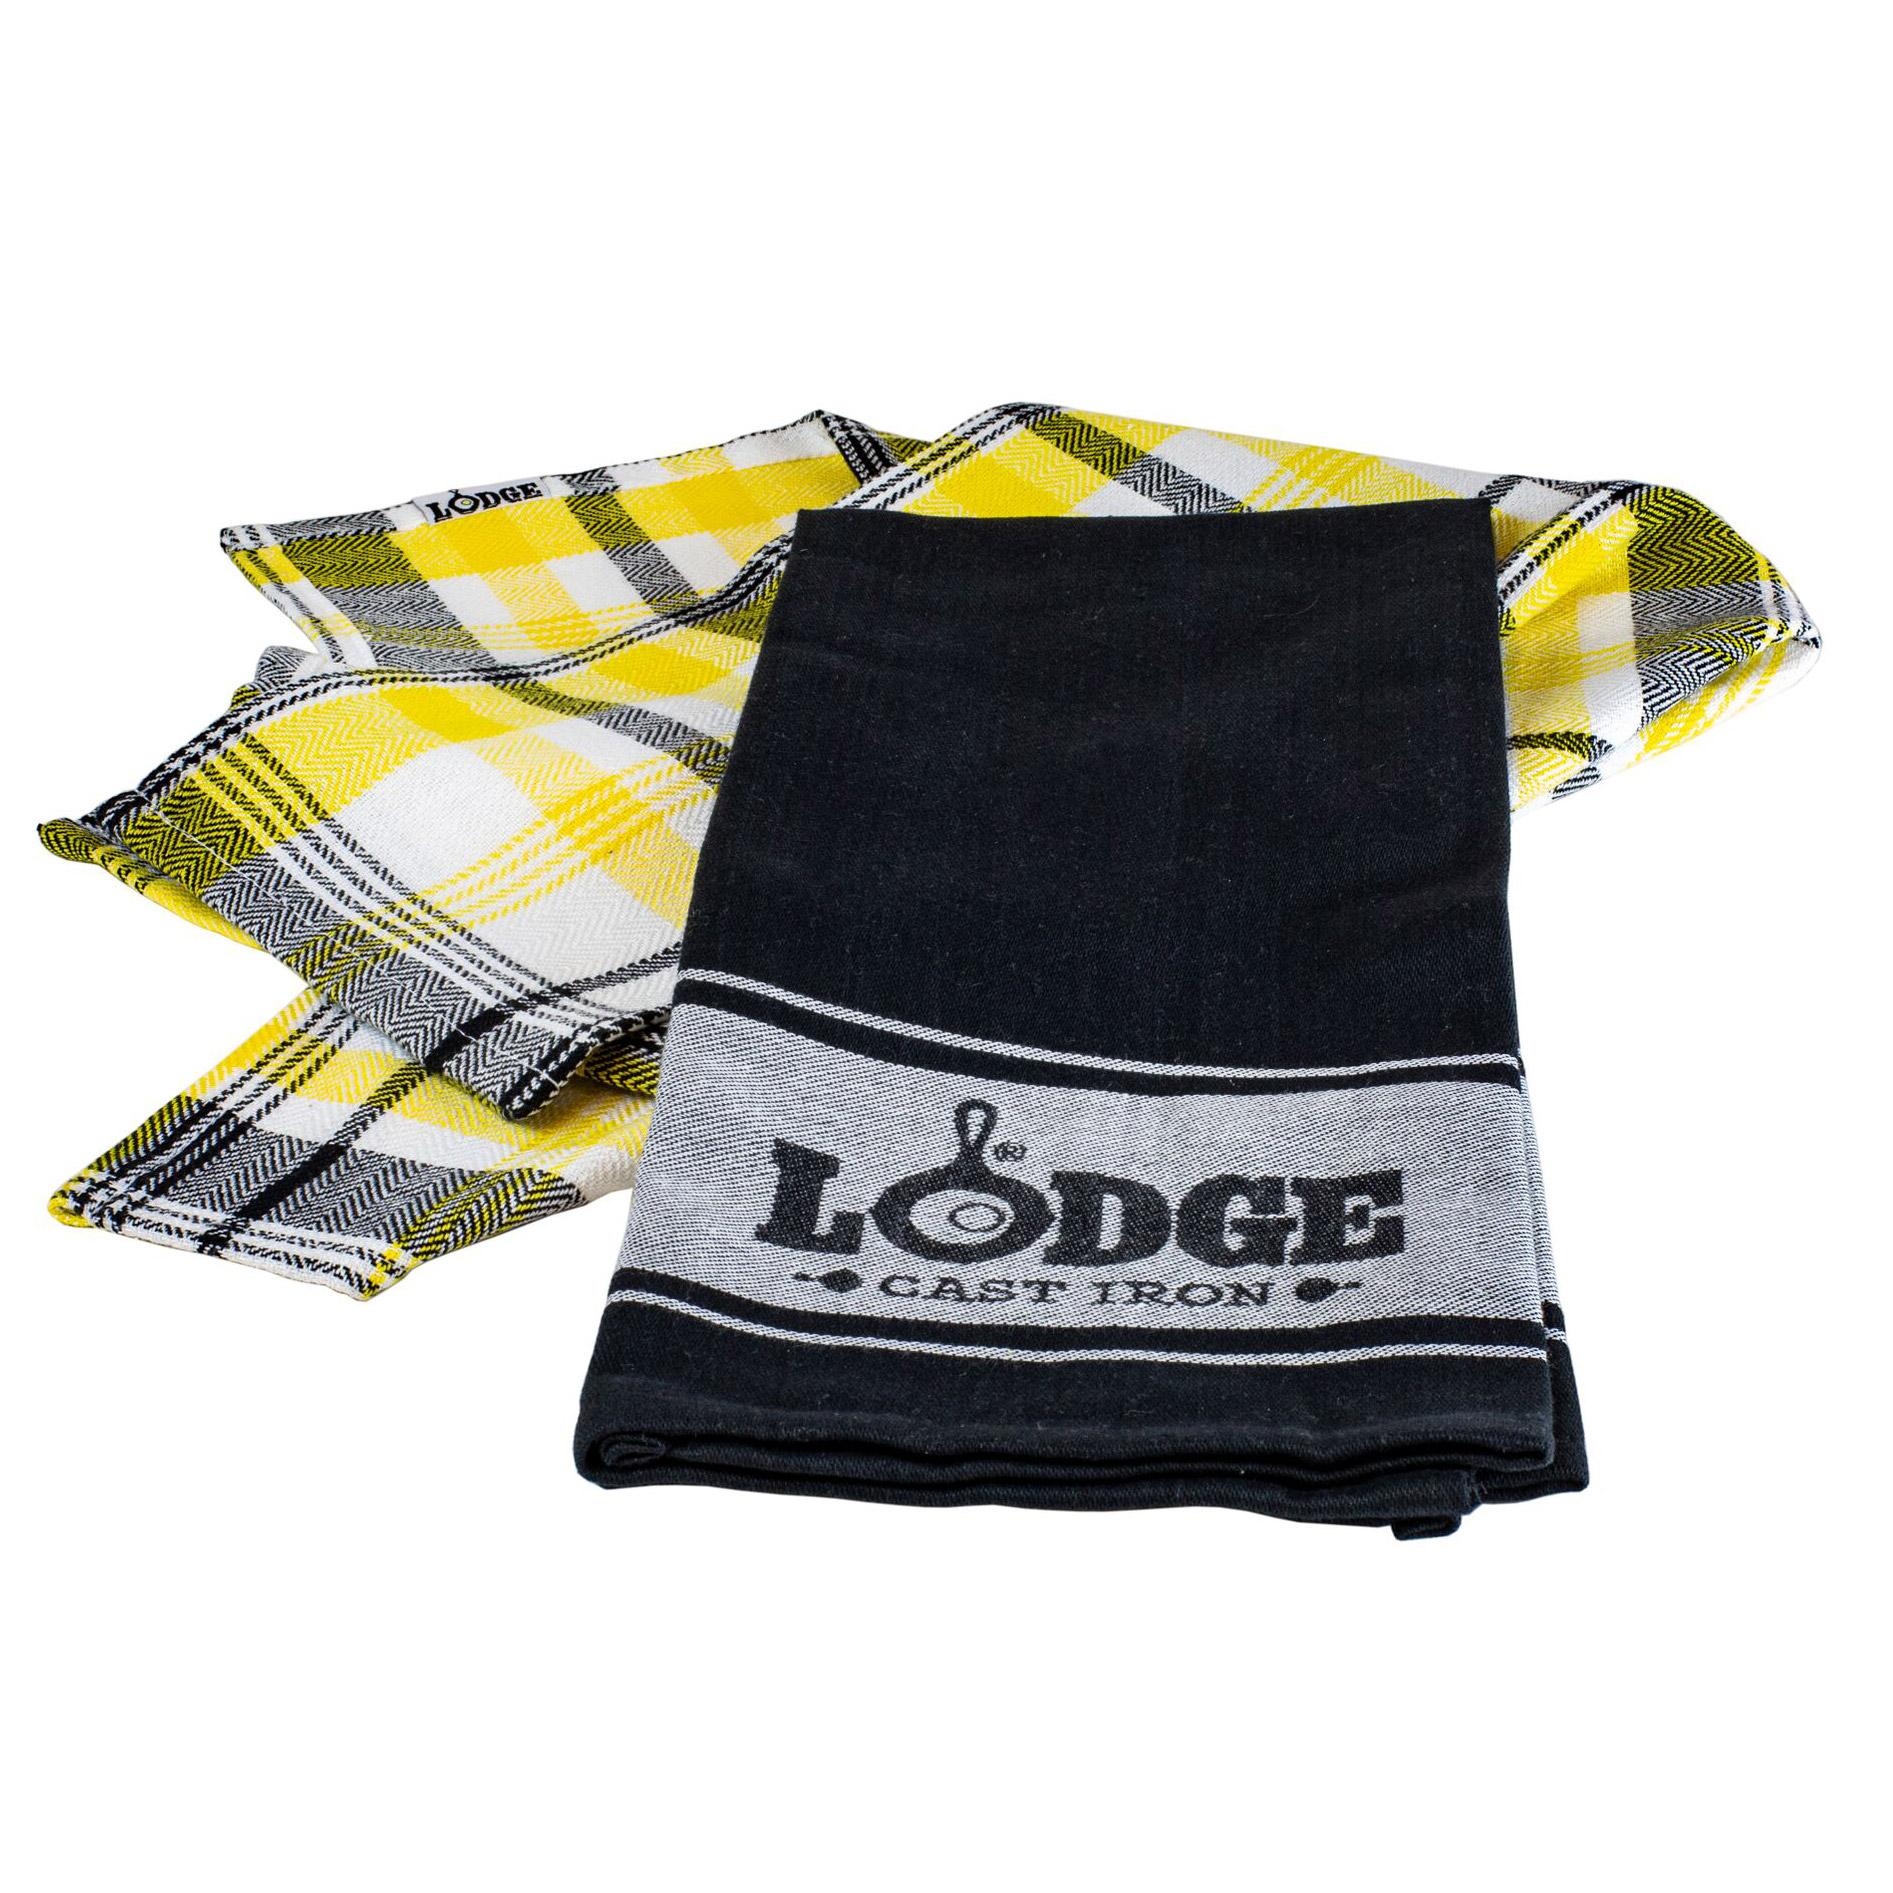 Lodge Manufacturing ADT2SETA towel, kitchen